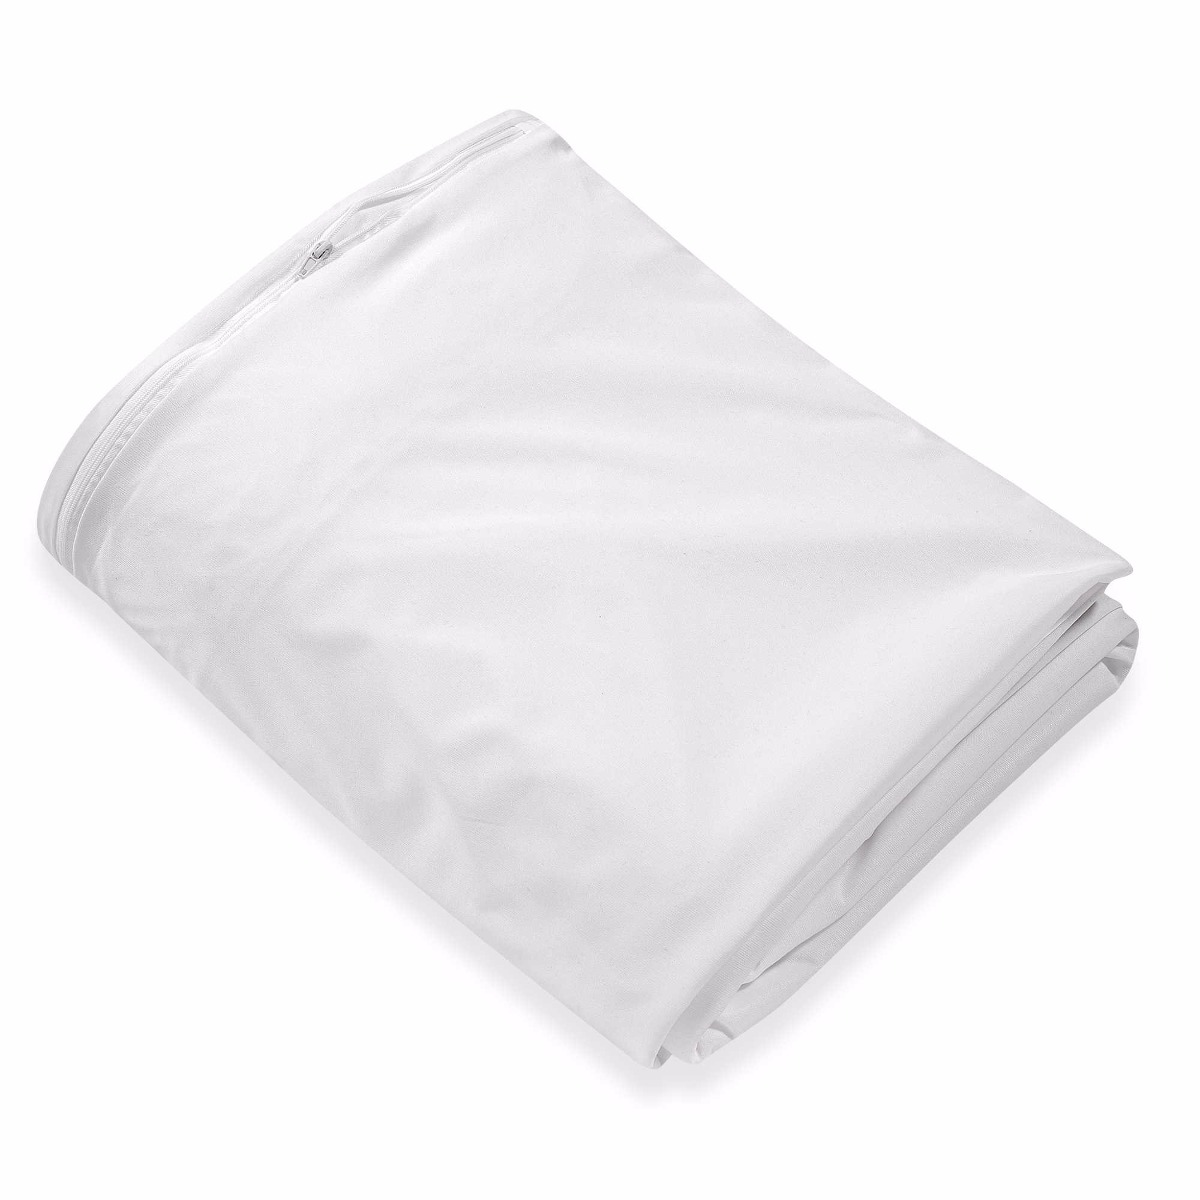 Protector de colch n arcansas impermeable cama doble en mercado libre - Protector de colchones impermeables ...